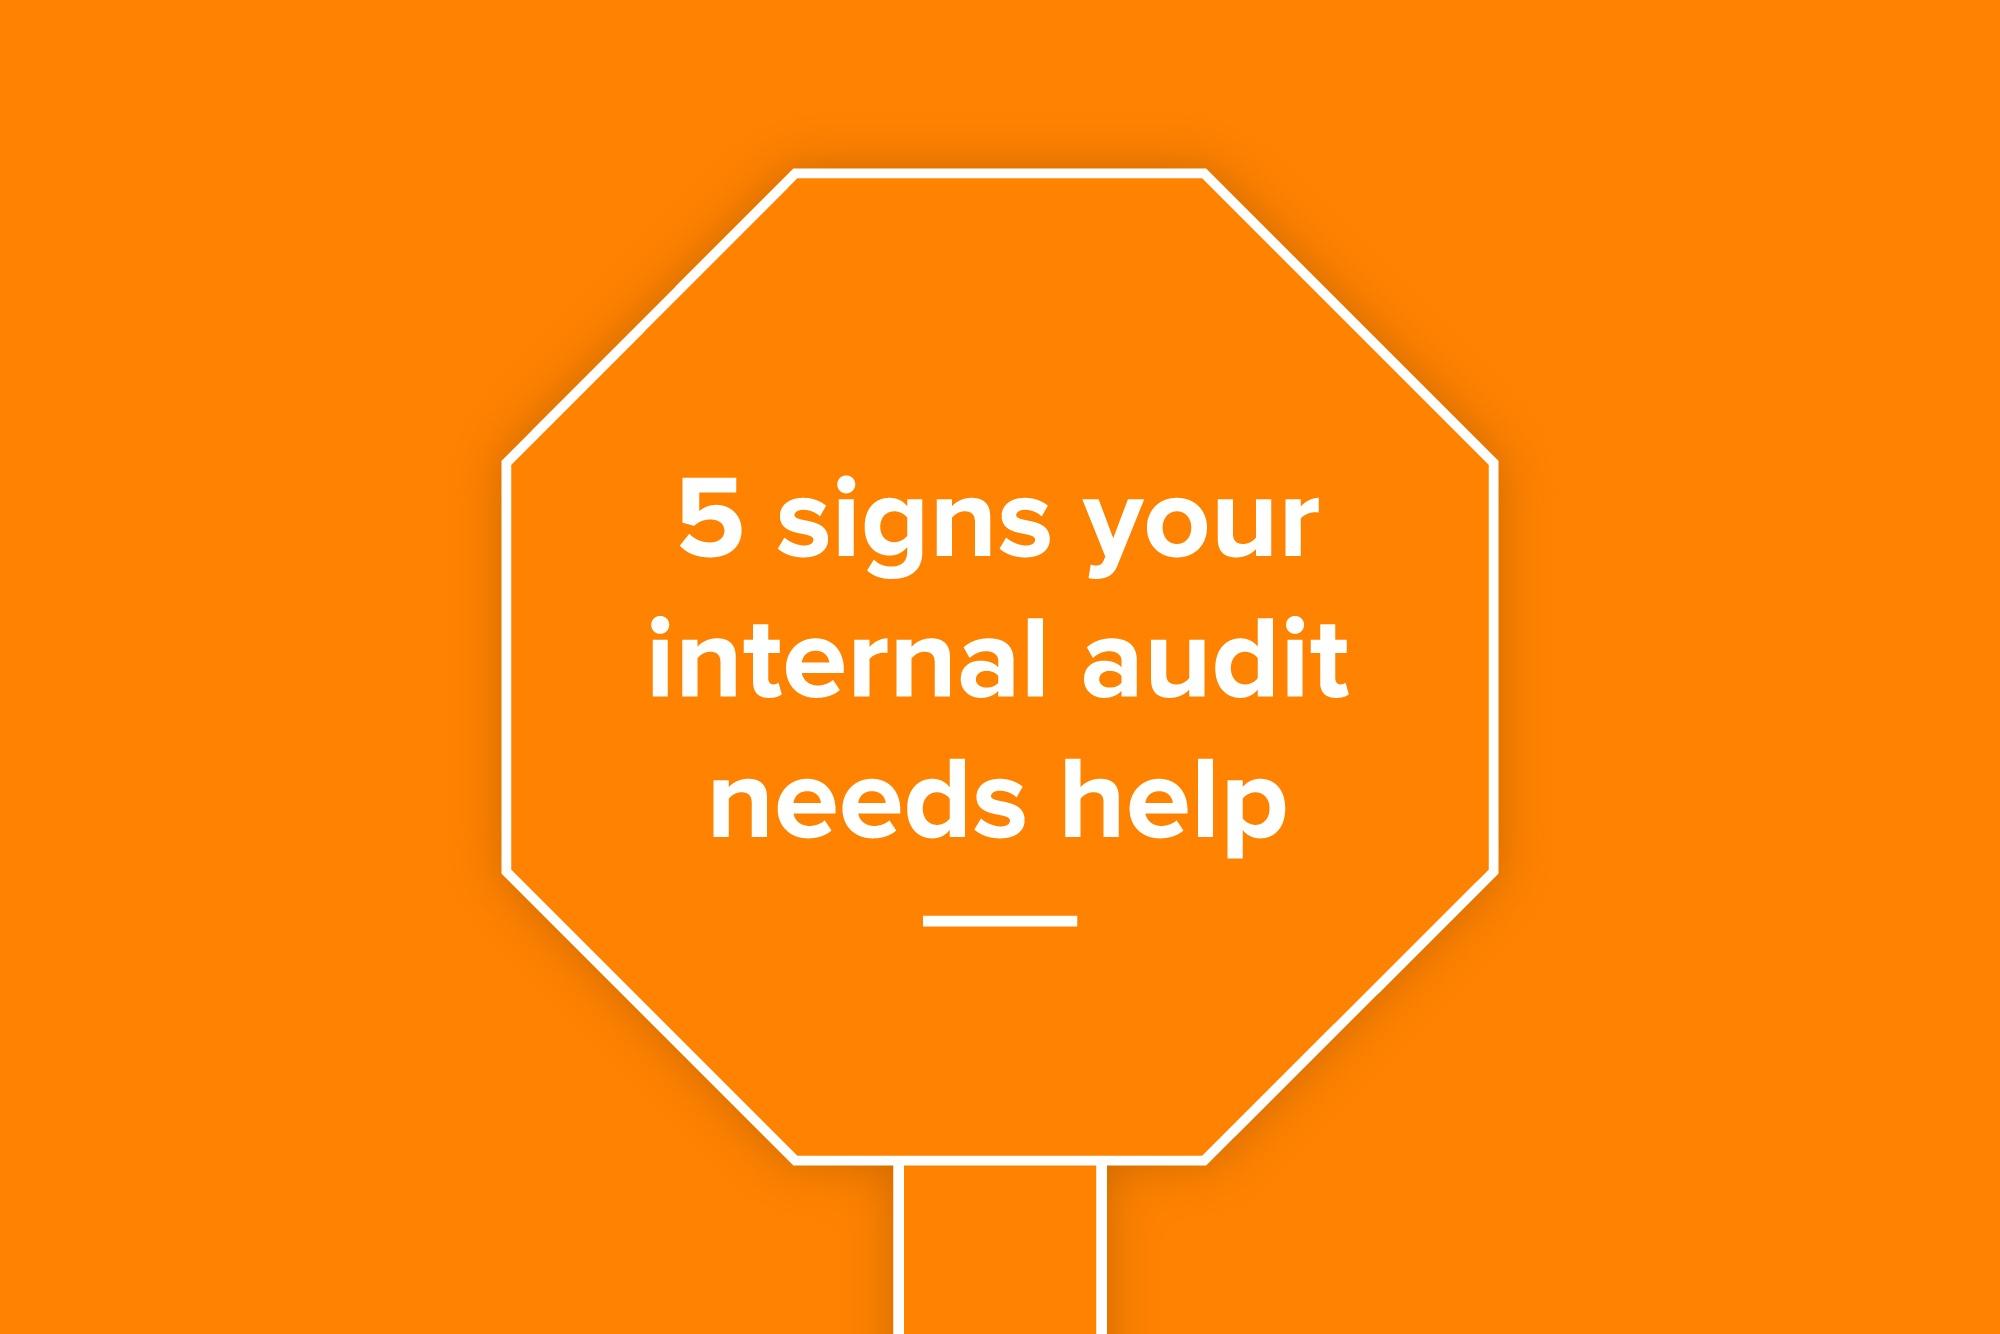 5-signs-internal-audit-help